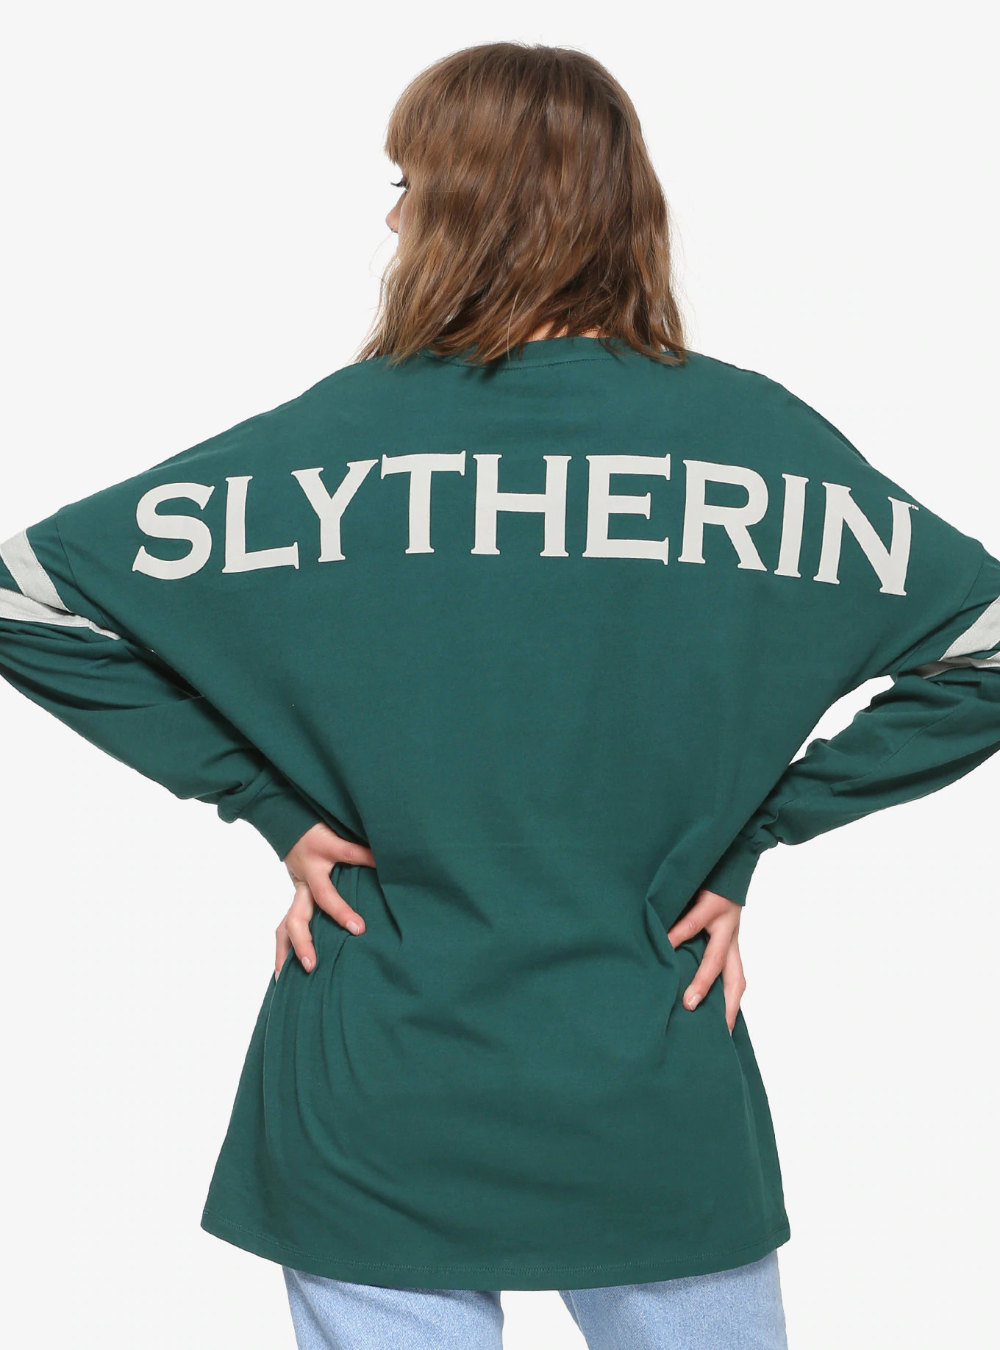 Harry Potter Slytherin House Hype Jersey Boxlunch Exclusive Slytherin Clothes Slytherin Fashion Slytherin [ 1350 x 1000 Pixel ]